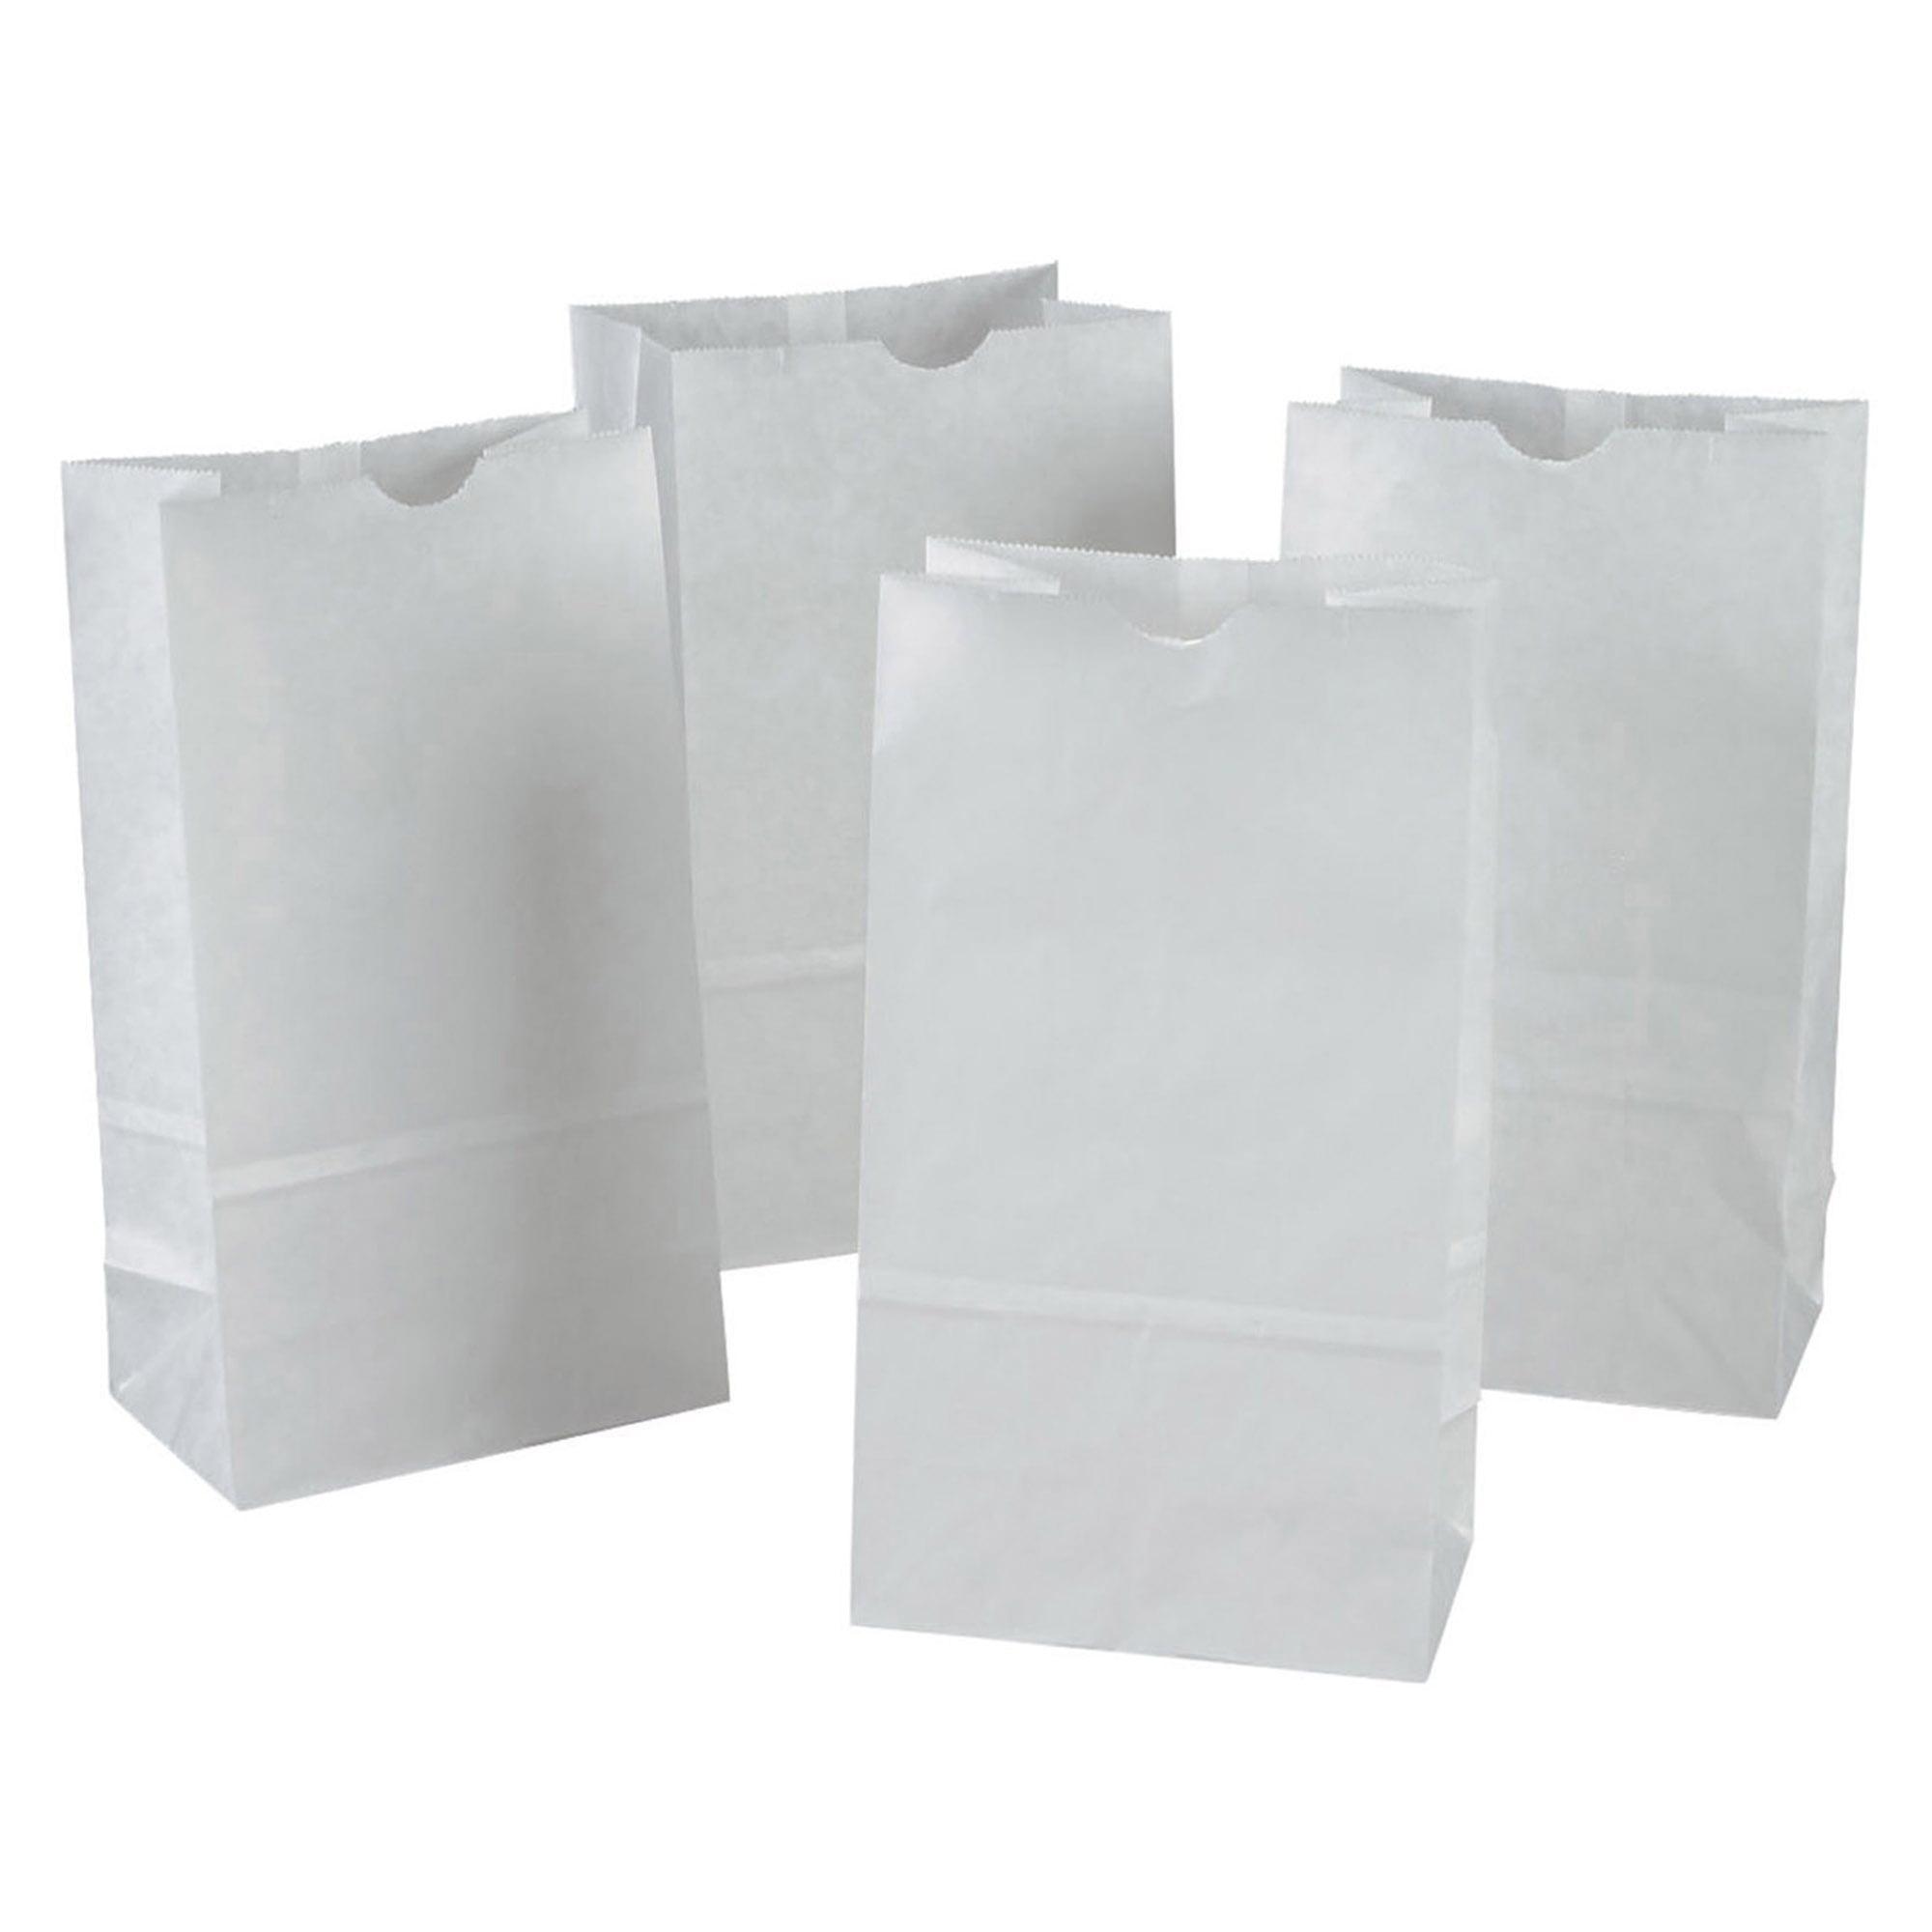 "Pacon® Rainbow® Kraft Paper Bags, 6"" x 11"", White, Pack of 100"